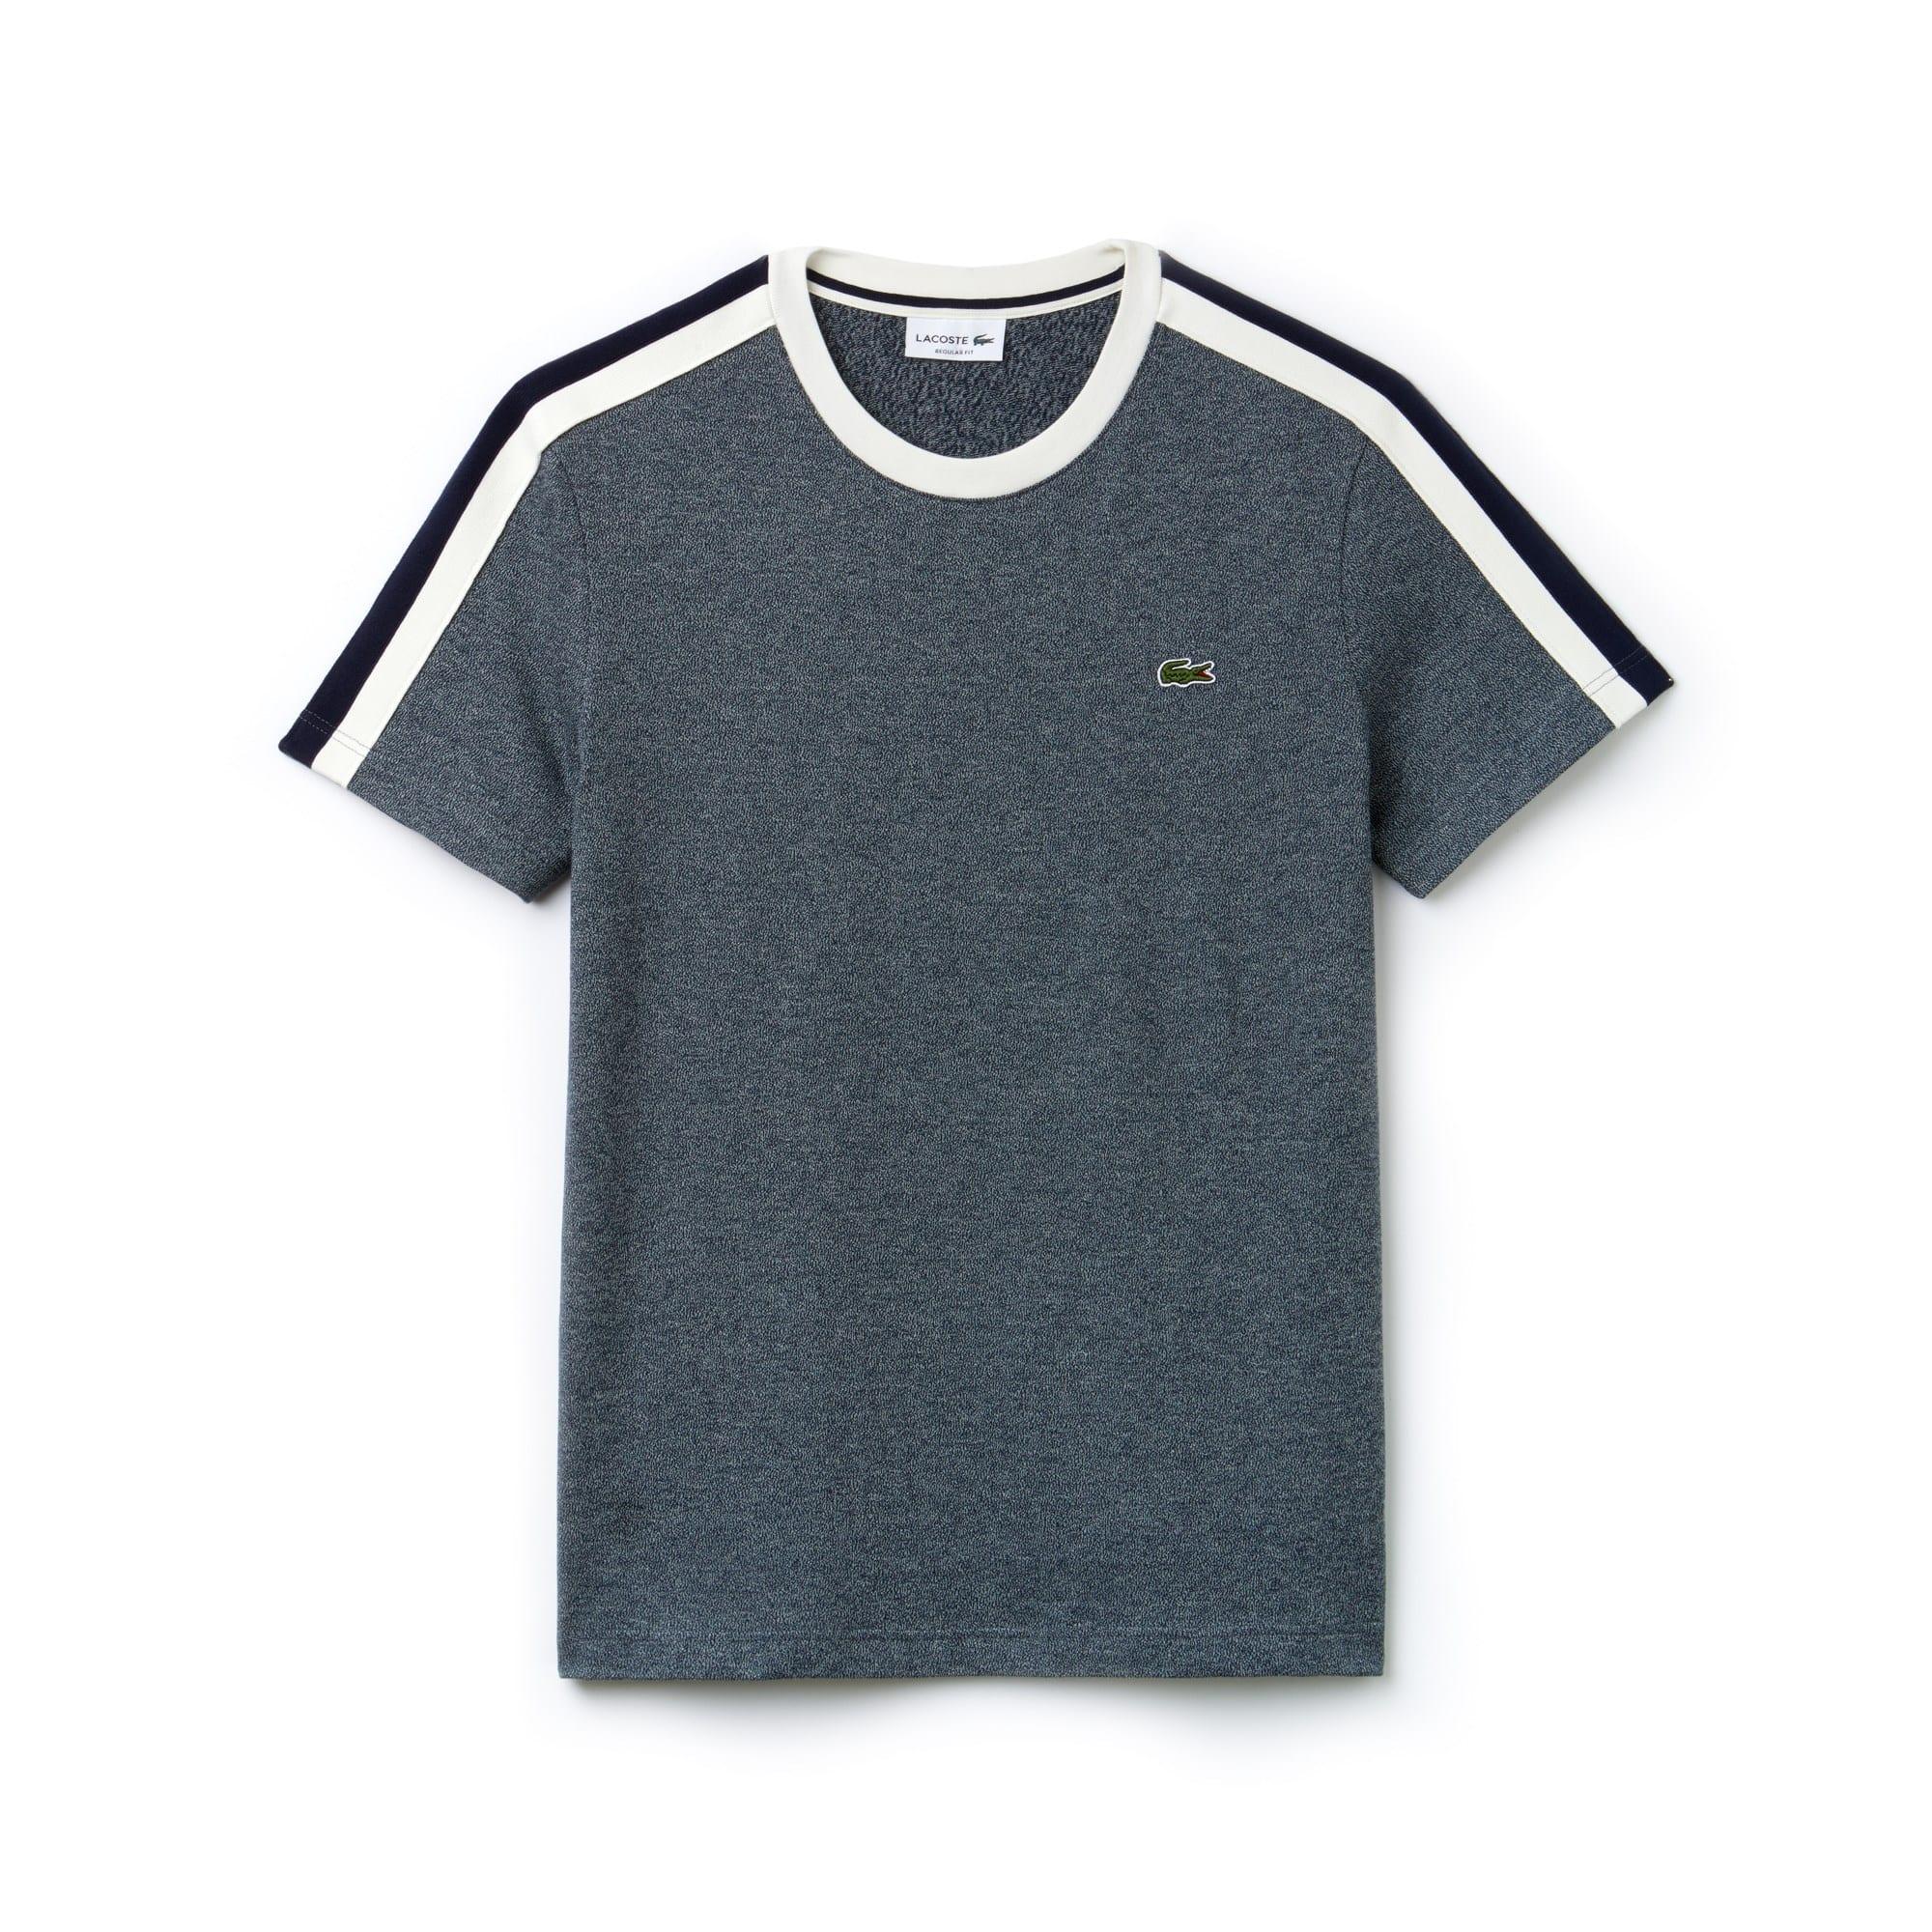 Men's Crew Neck Contrast Band Jersey T-shirt